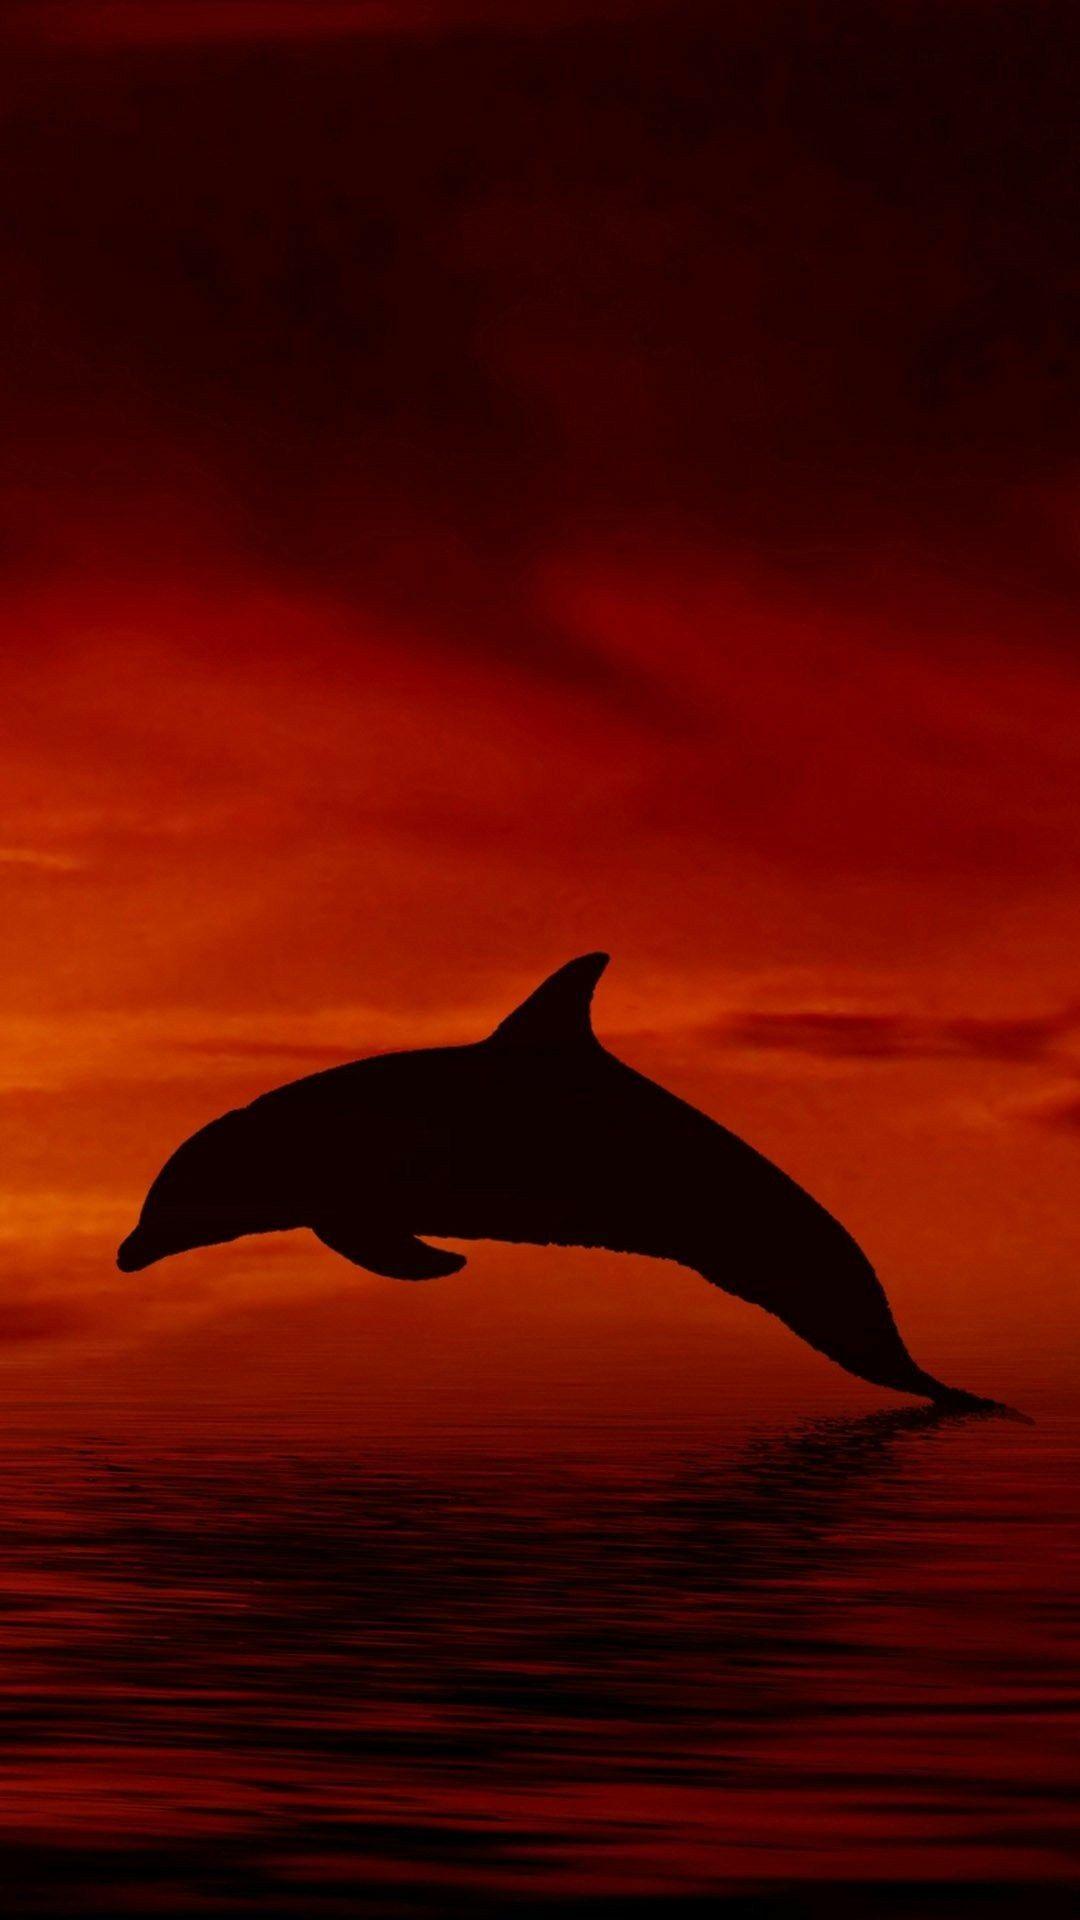 Dolphin wallpaper Wallpaper, Hd wallpaper, Amazing hd